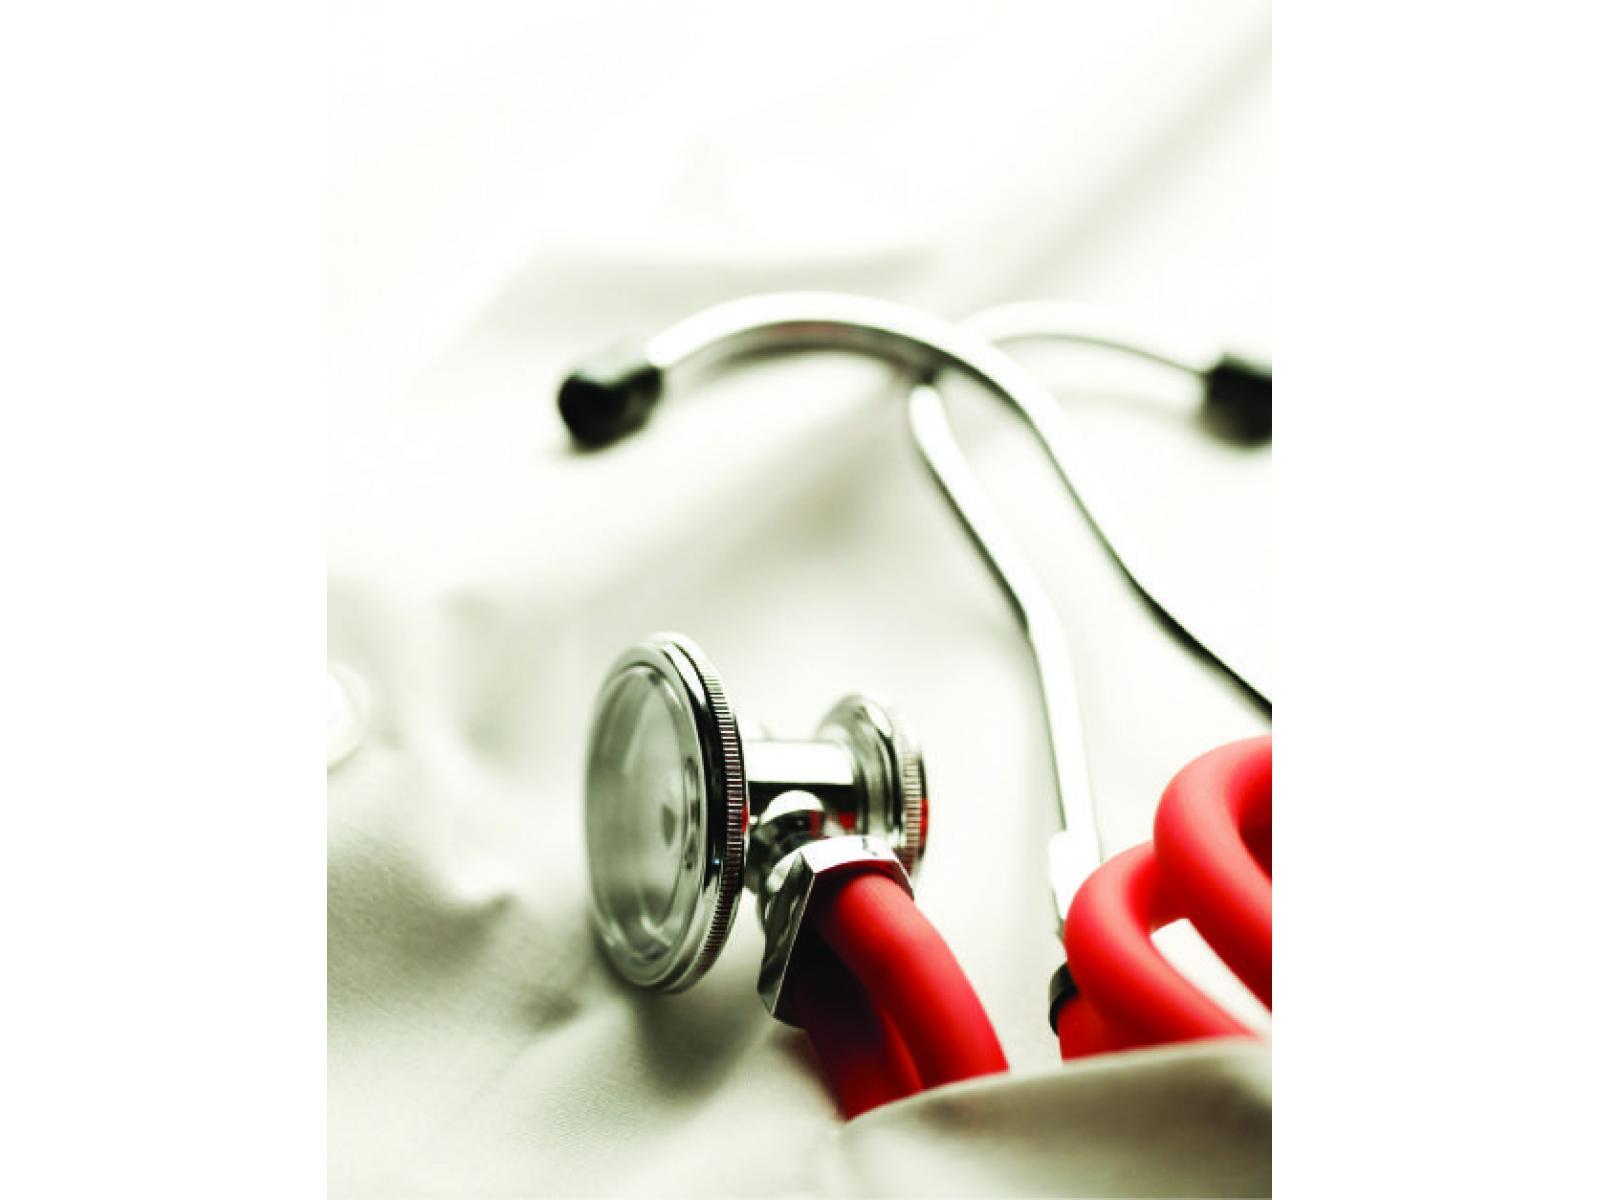 CMI DR. ILIAS VLAD TEODOR - REUMATOLOGIE - 2.jpg